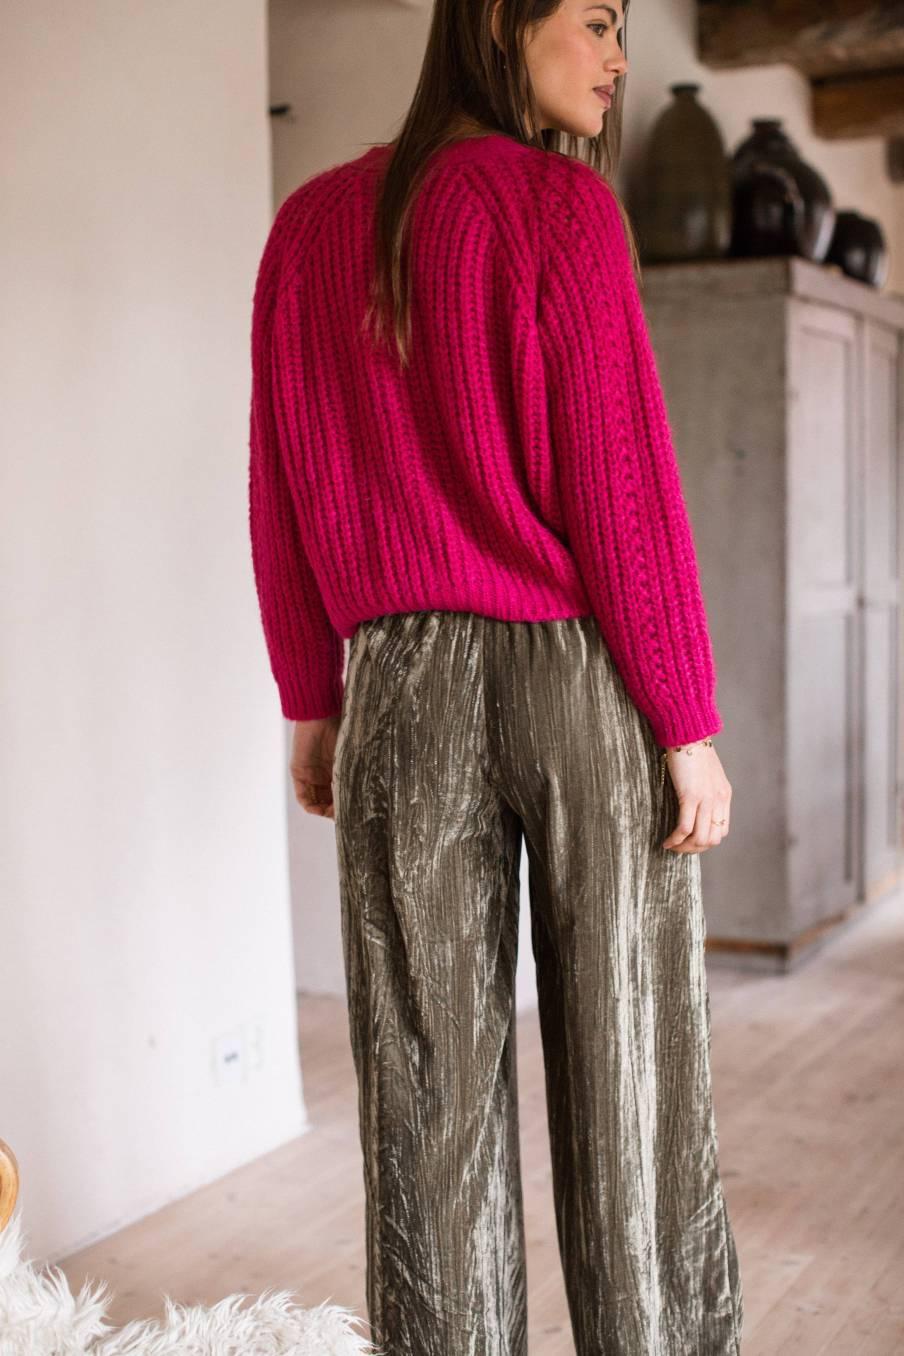 boheme chic vintage pantalon femme olivia olive velvet